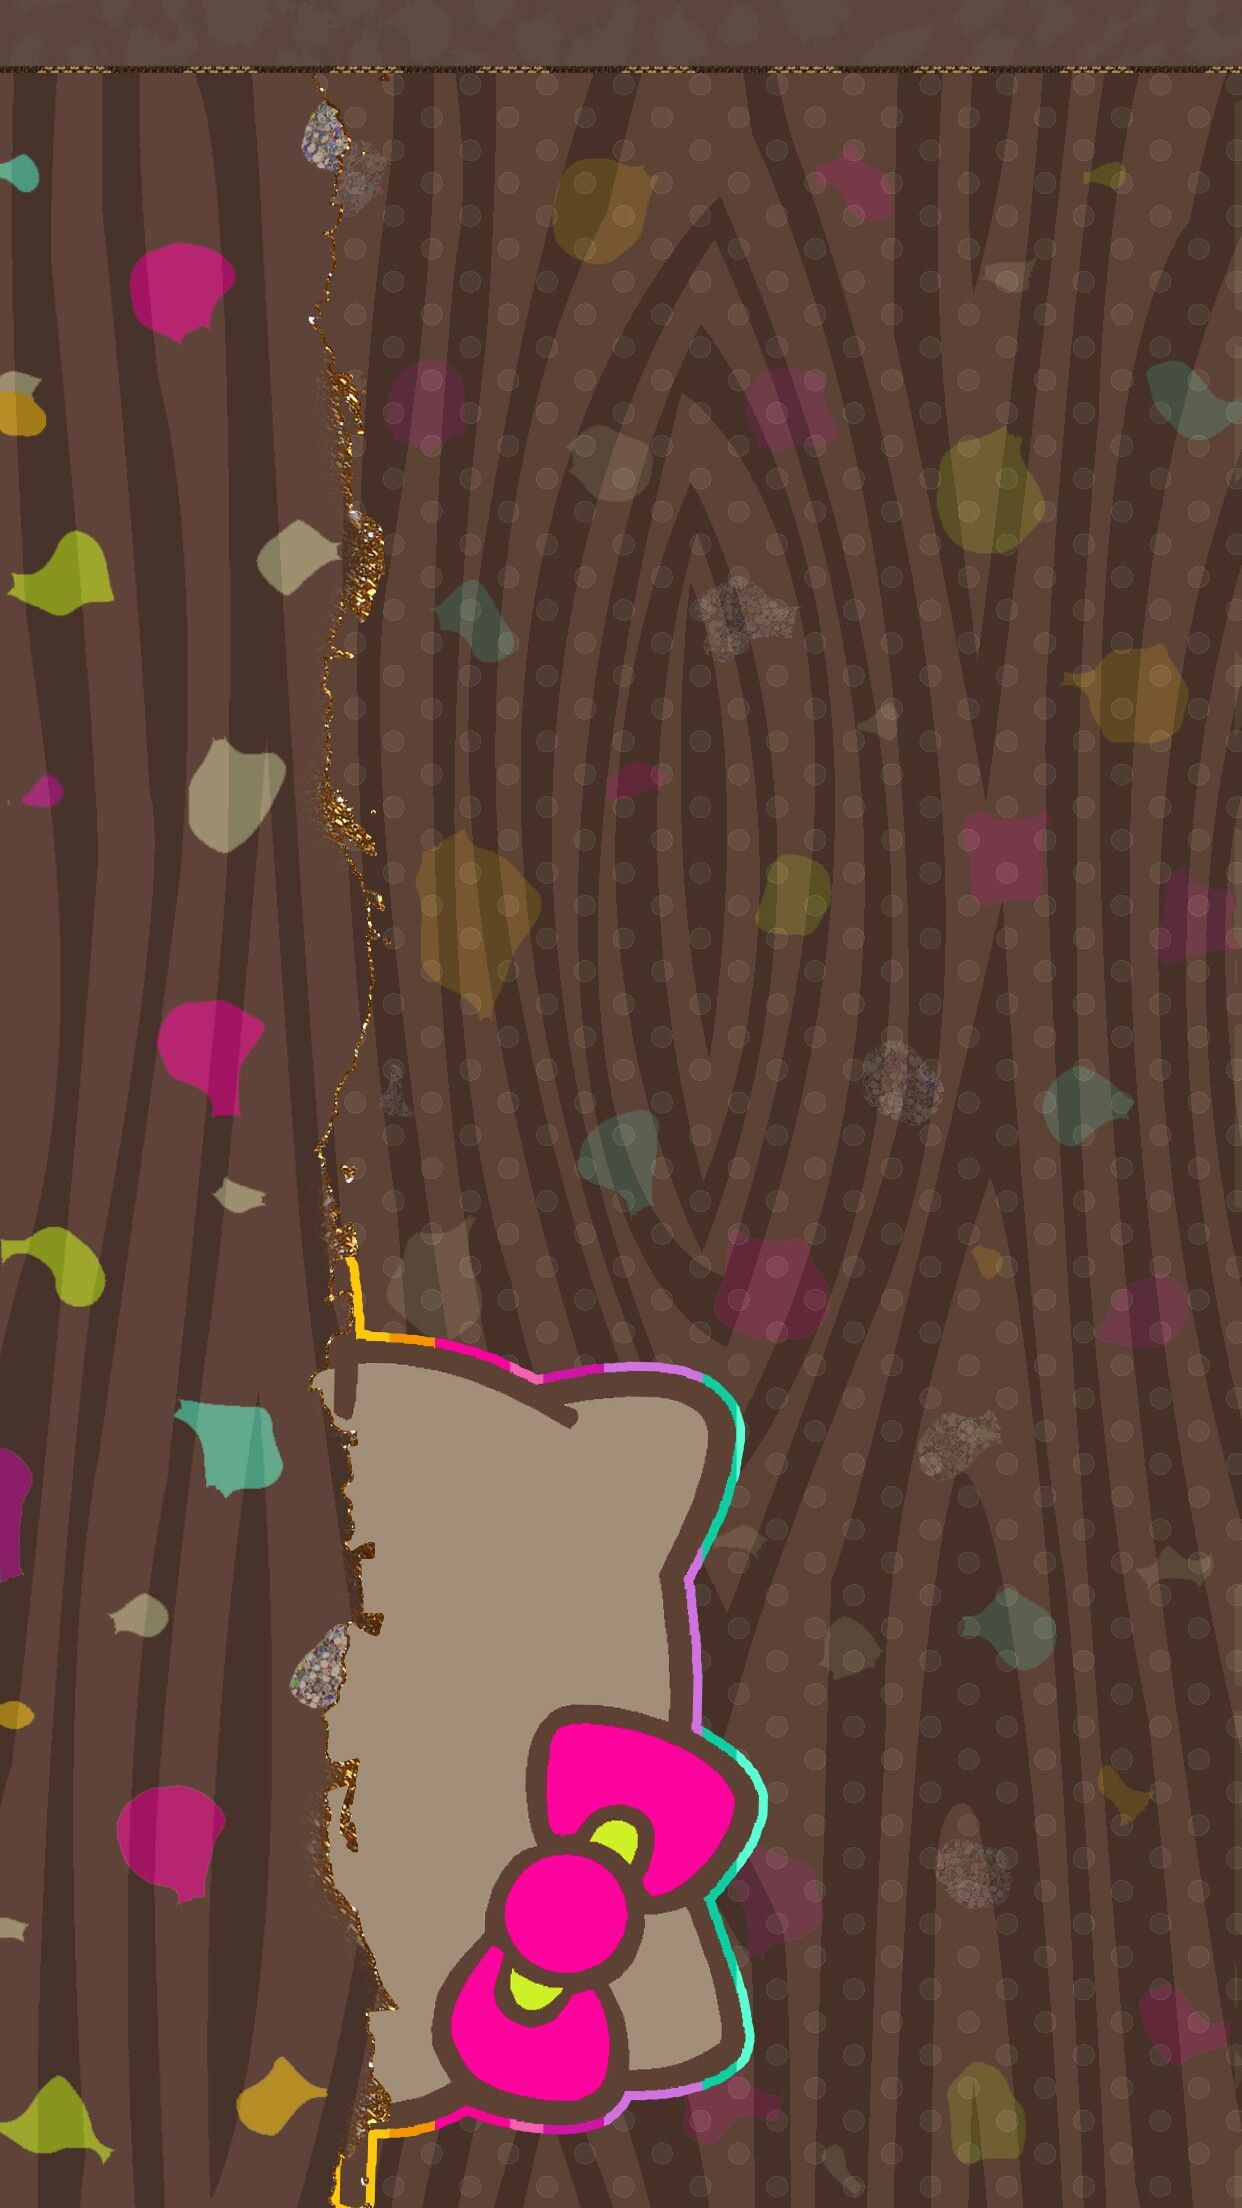 Top Wallpaper Hello Kitty Wall - 88ec3262ff897dba228c500cebaea81f  Picture_55643.jpg